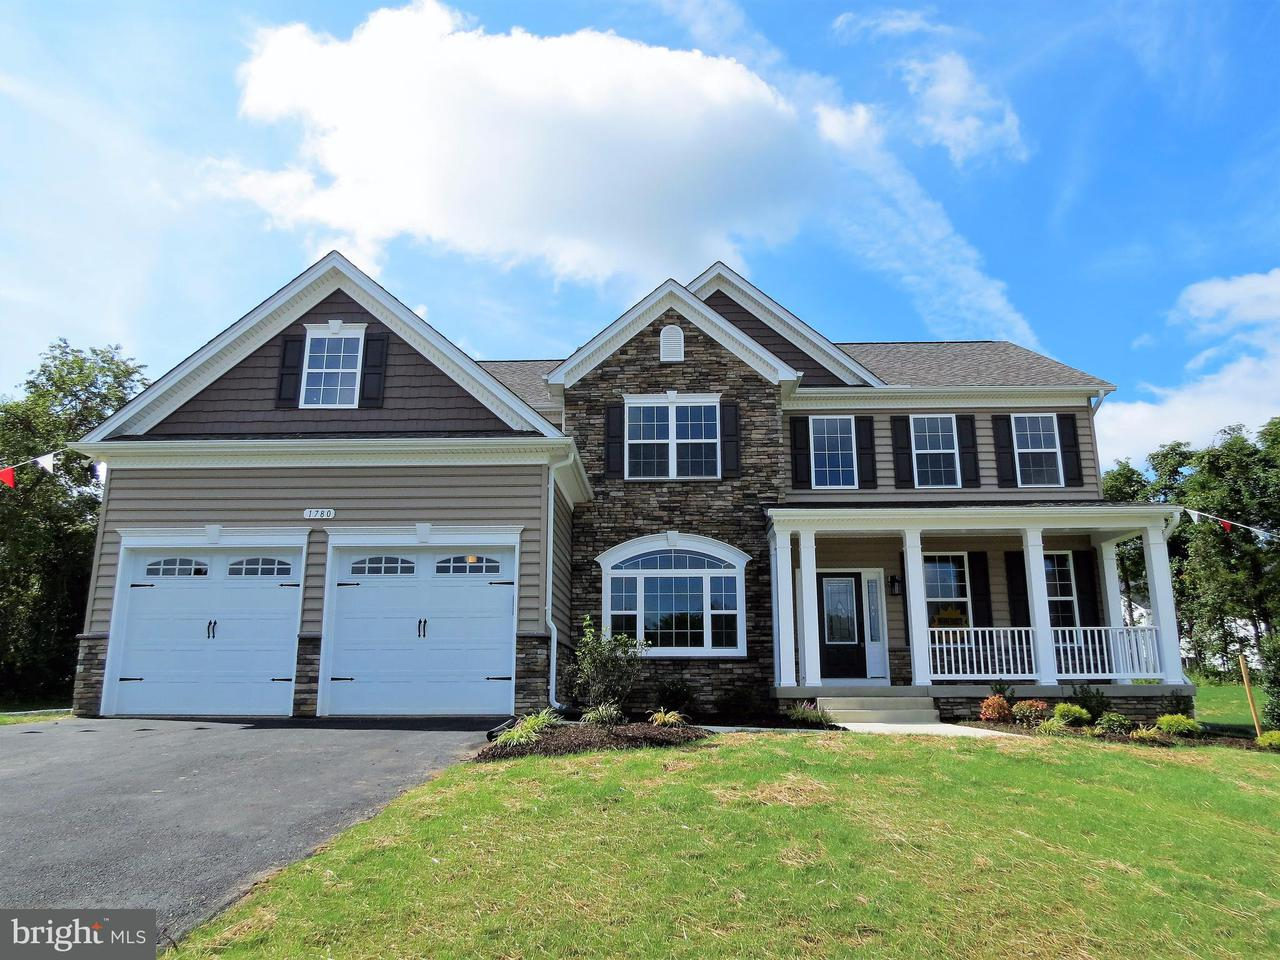 独户住宅 为 销售 在 1780 PERSPECTIVE Place 1780 PERSPECTIVE Place Owings, 马里兰州 20736 美国